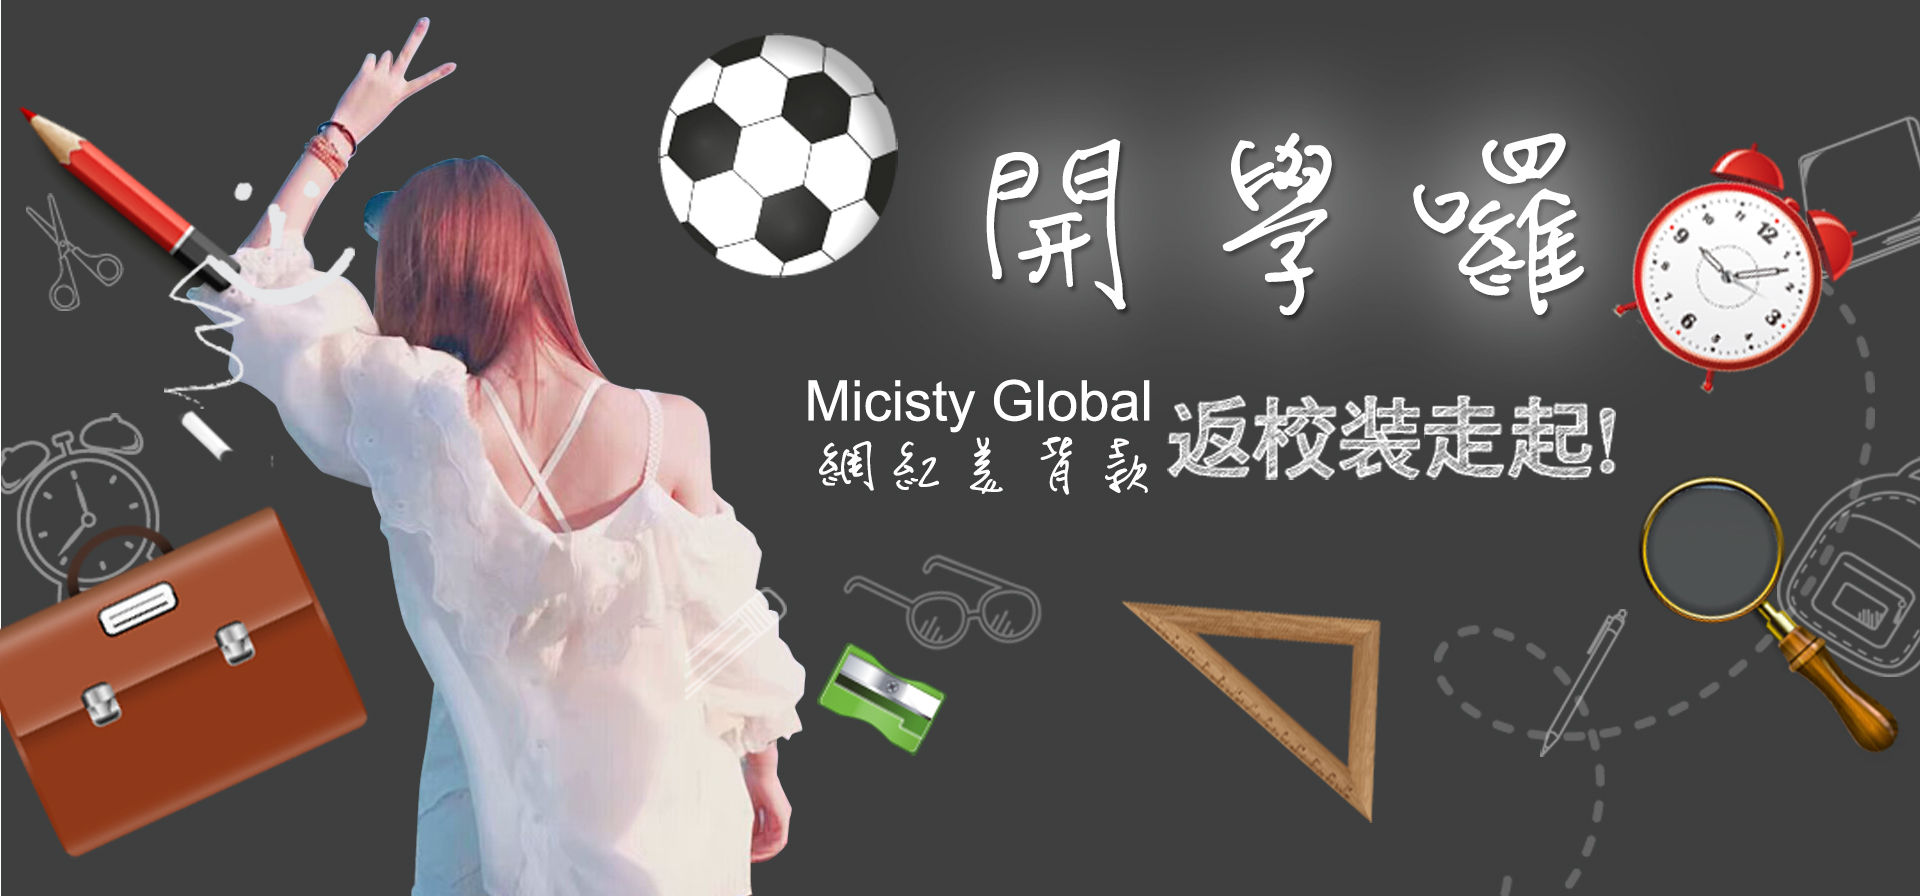 Micisty Global hot news